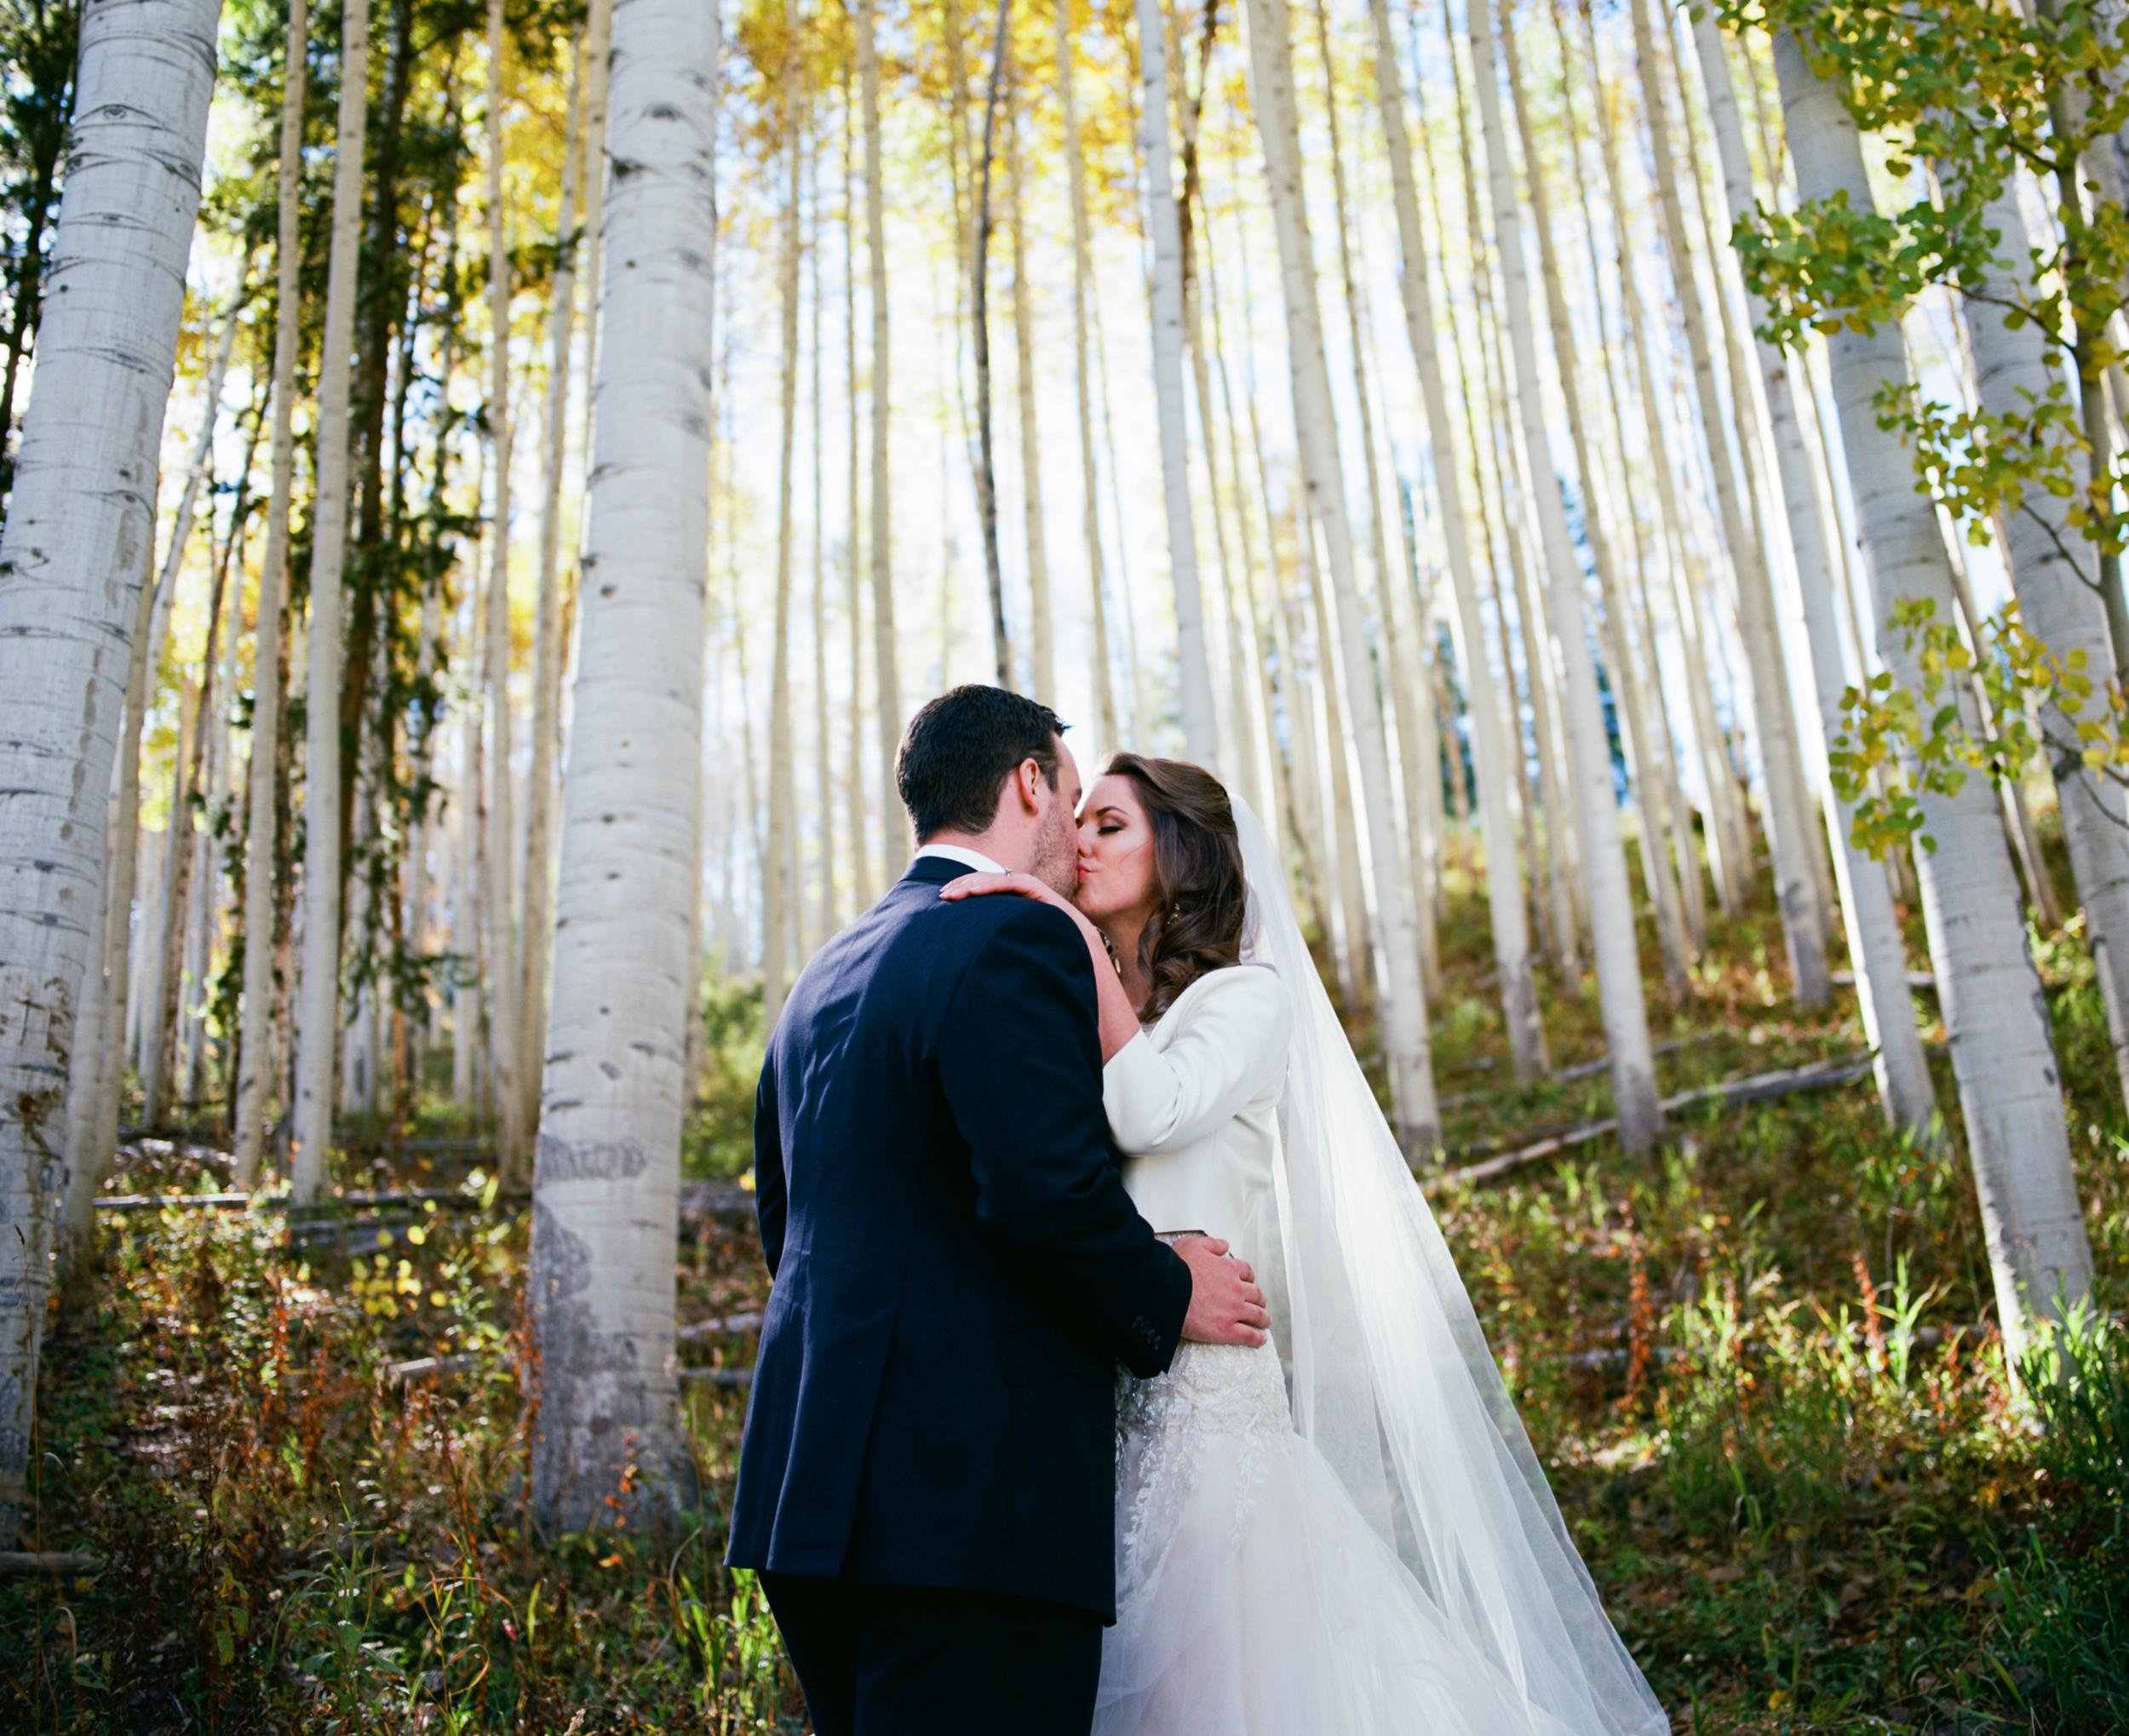 Kelly + Josh   Fall wedding at the Park Hyatt Beaver Creek   Dress by Reem Acra from Little White Dress   Ash Imagery